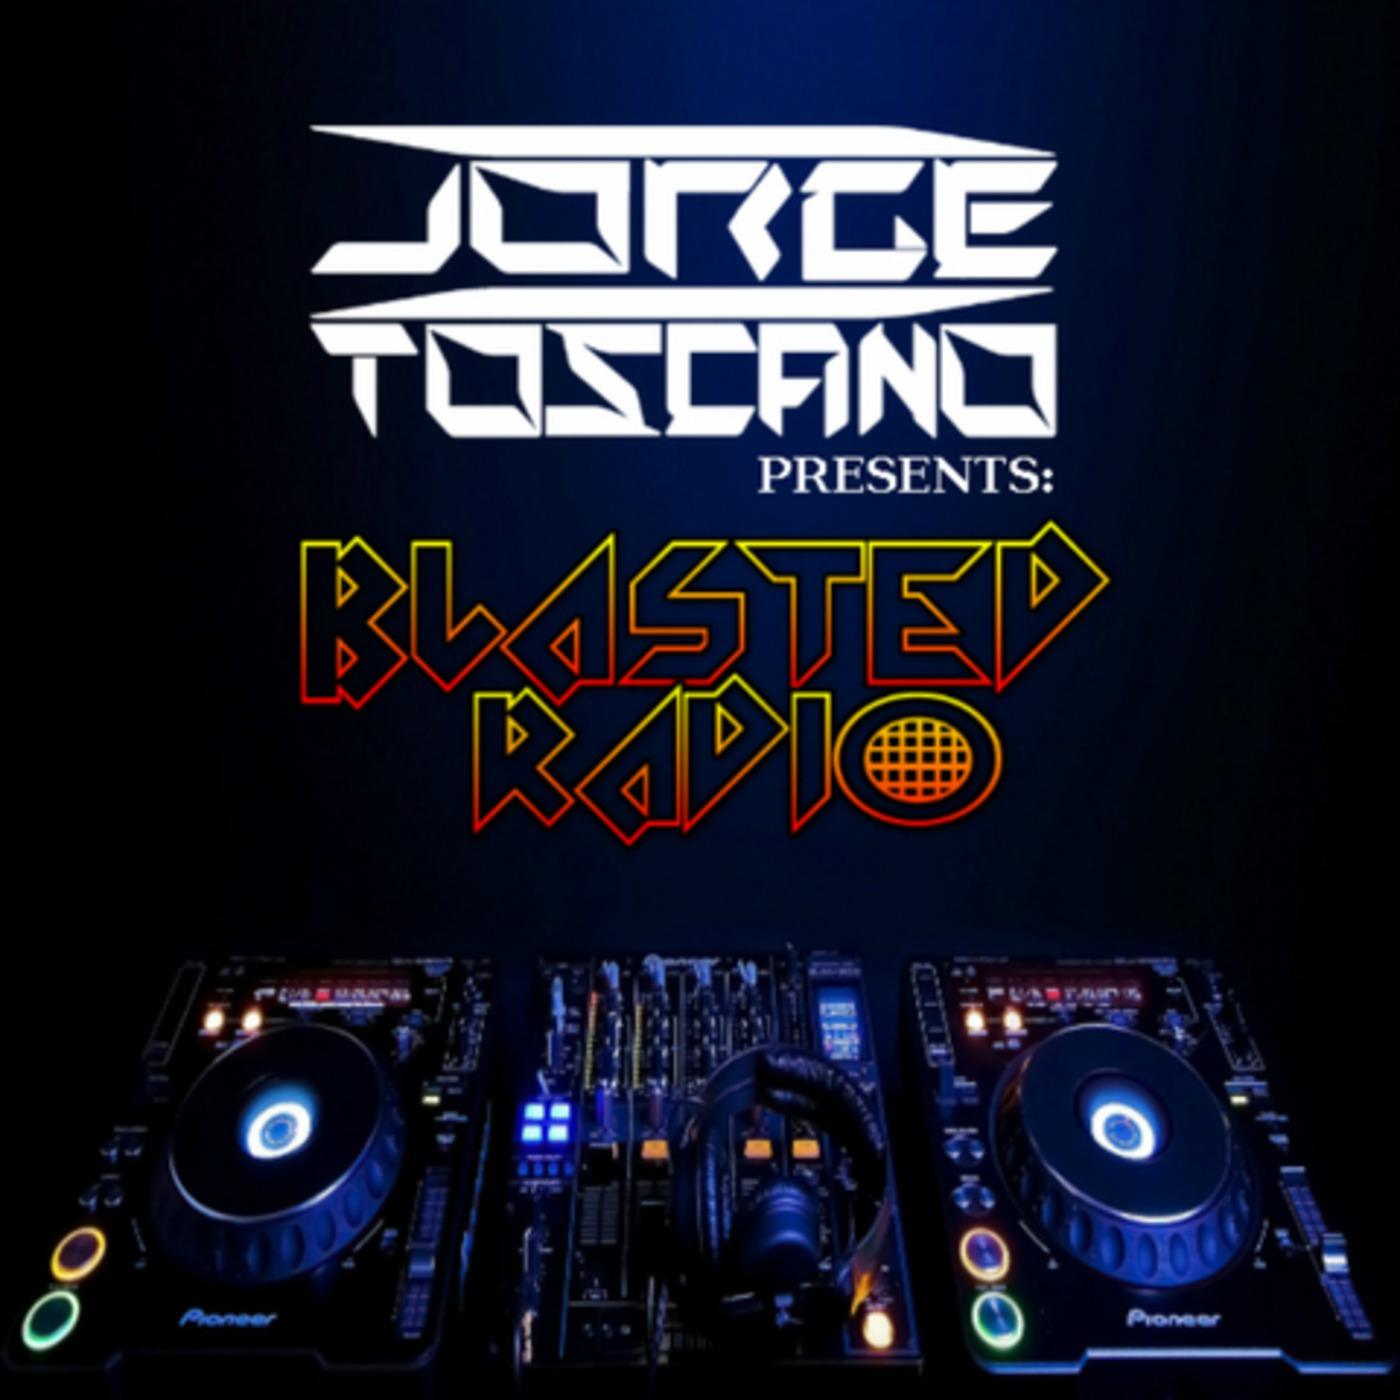 Jorge Toscano's : Blasted Radio